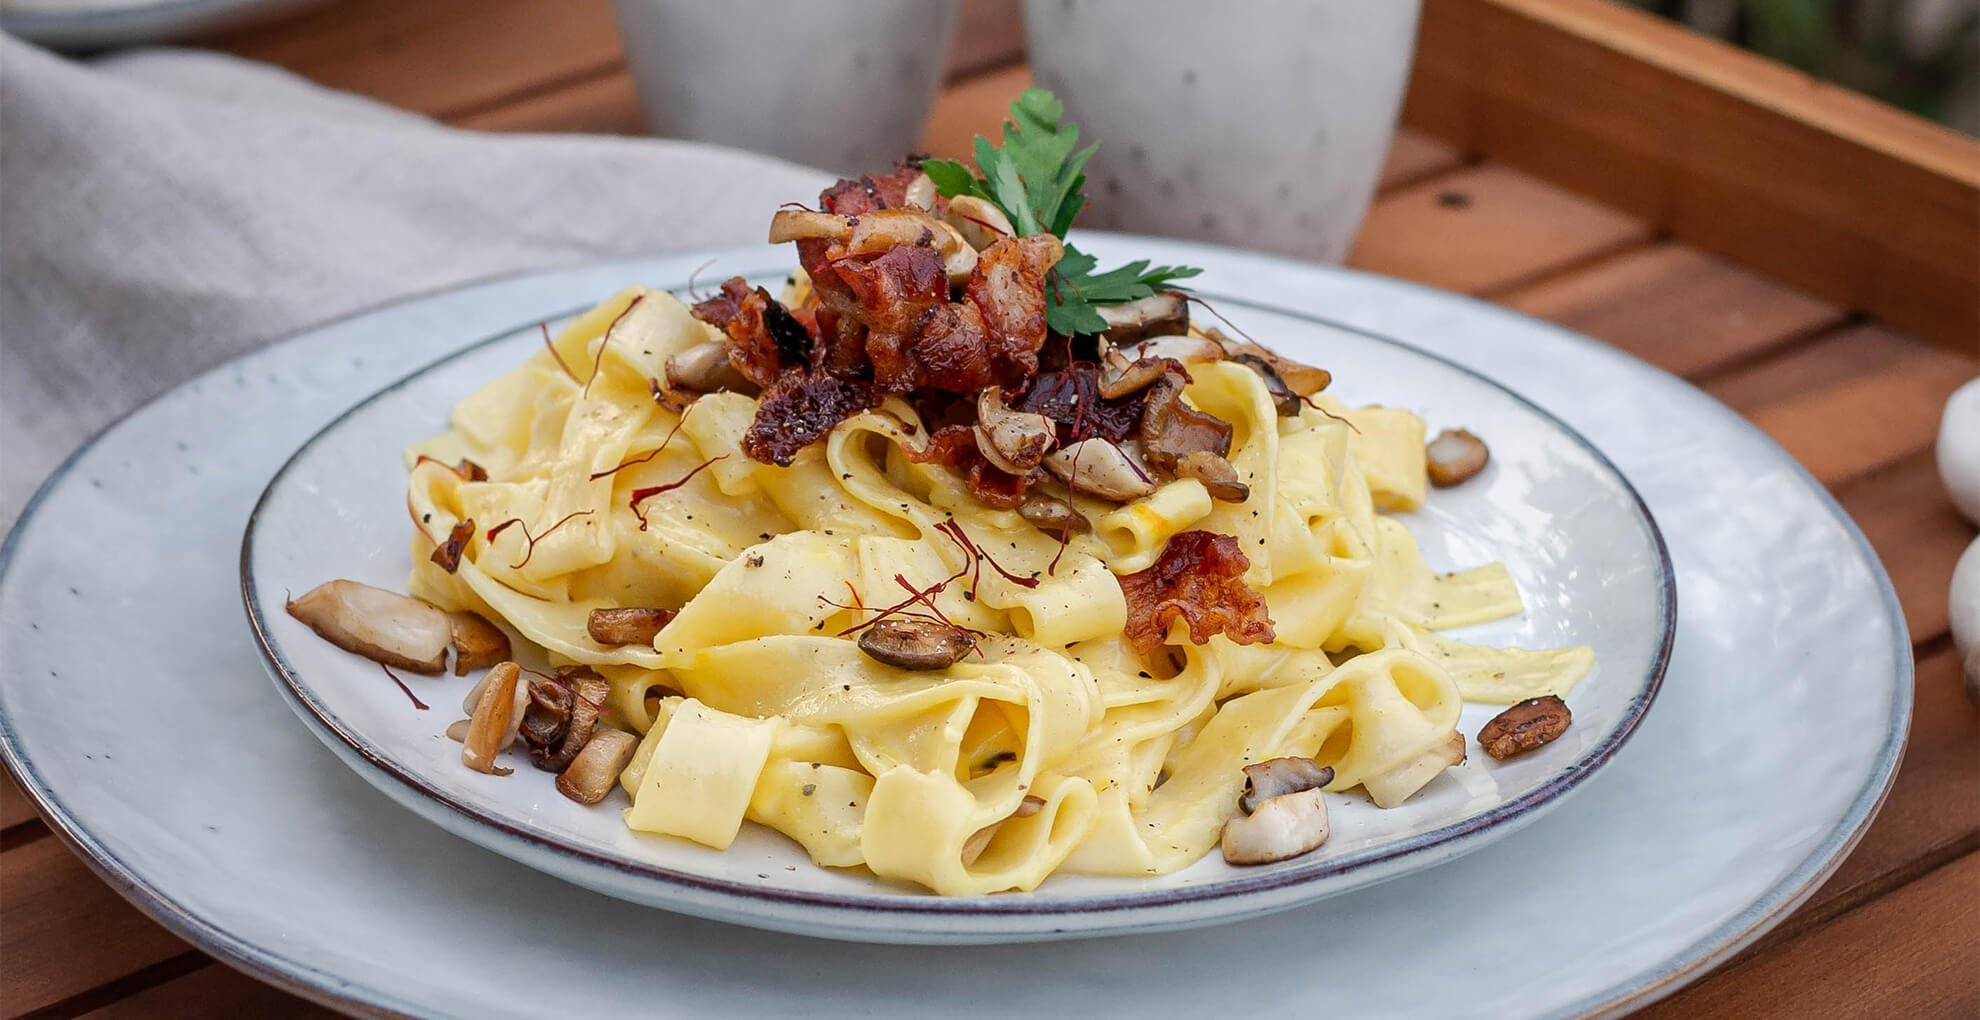 Bandnudeln in Safransauce mit Bacon Chips